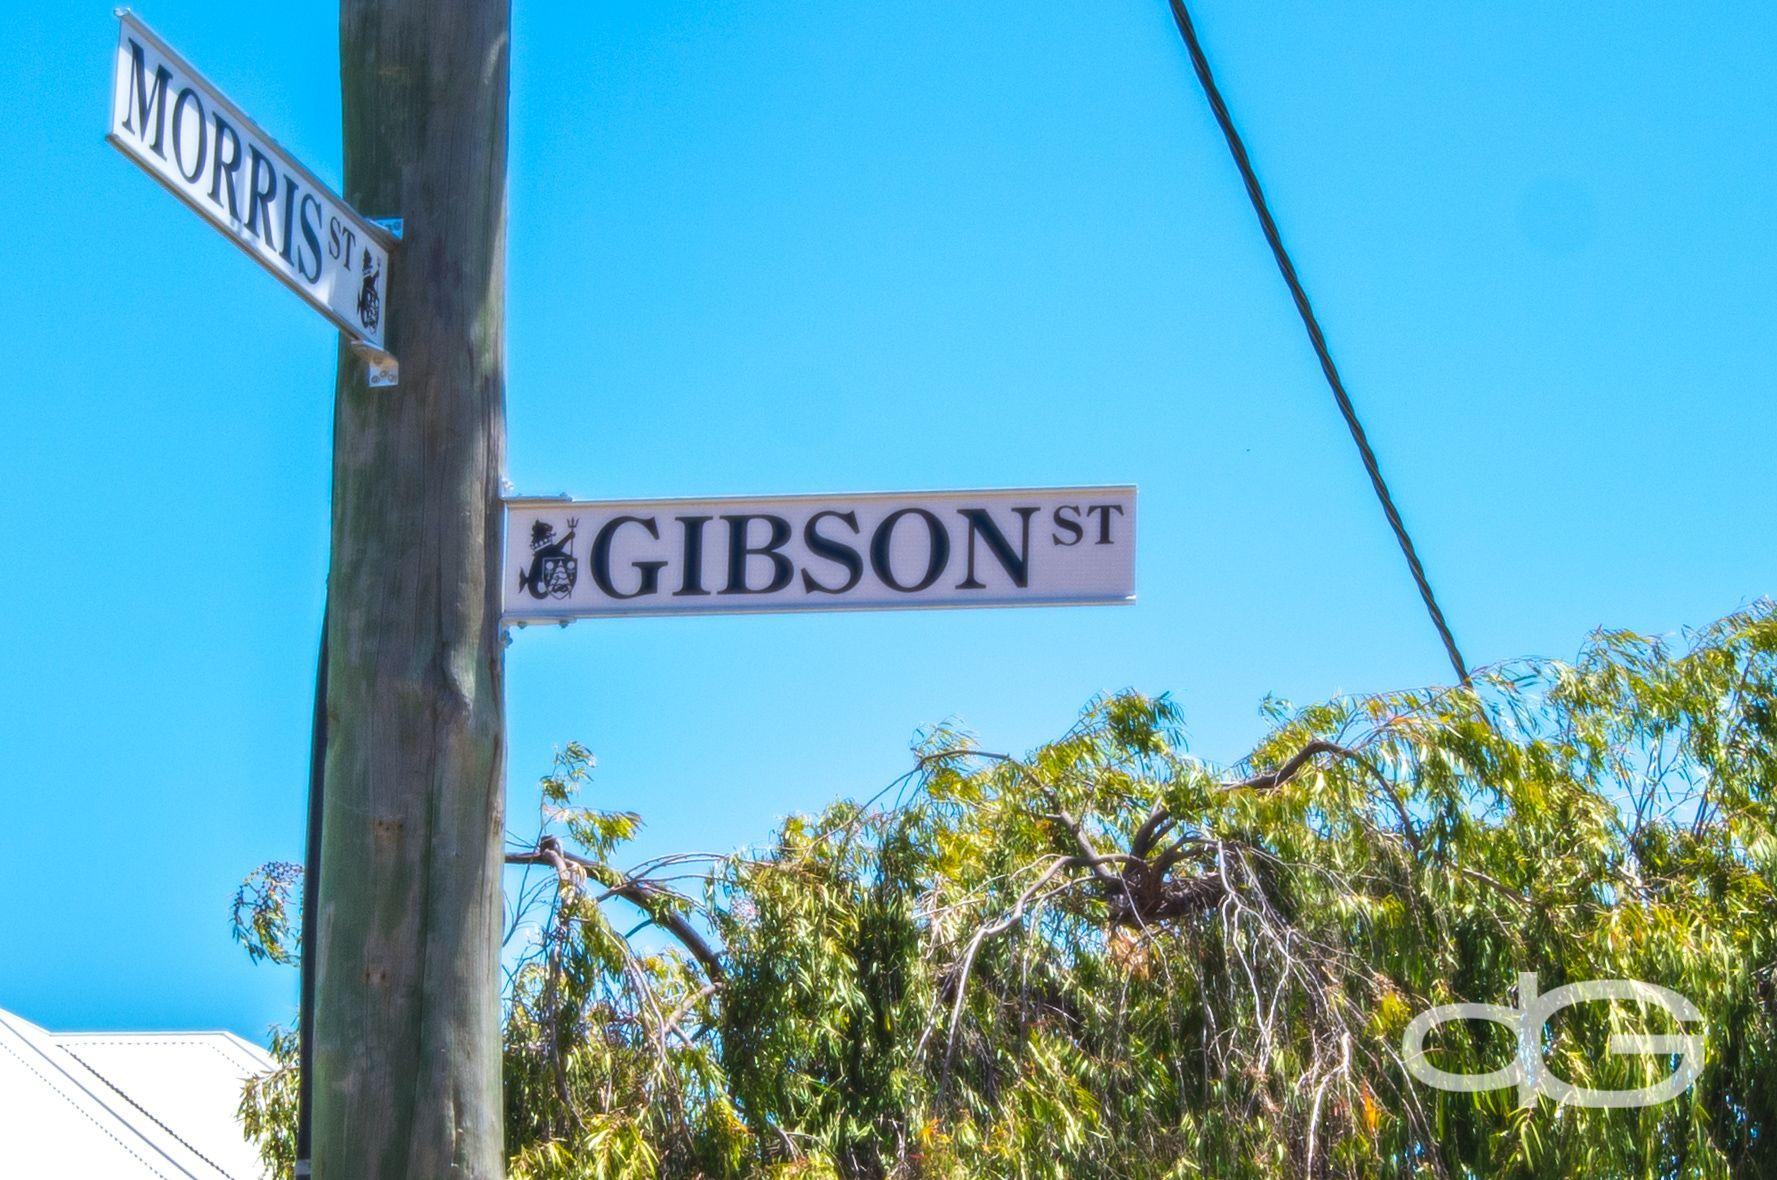 78A Gibson Street, Beaconsfield